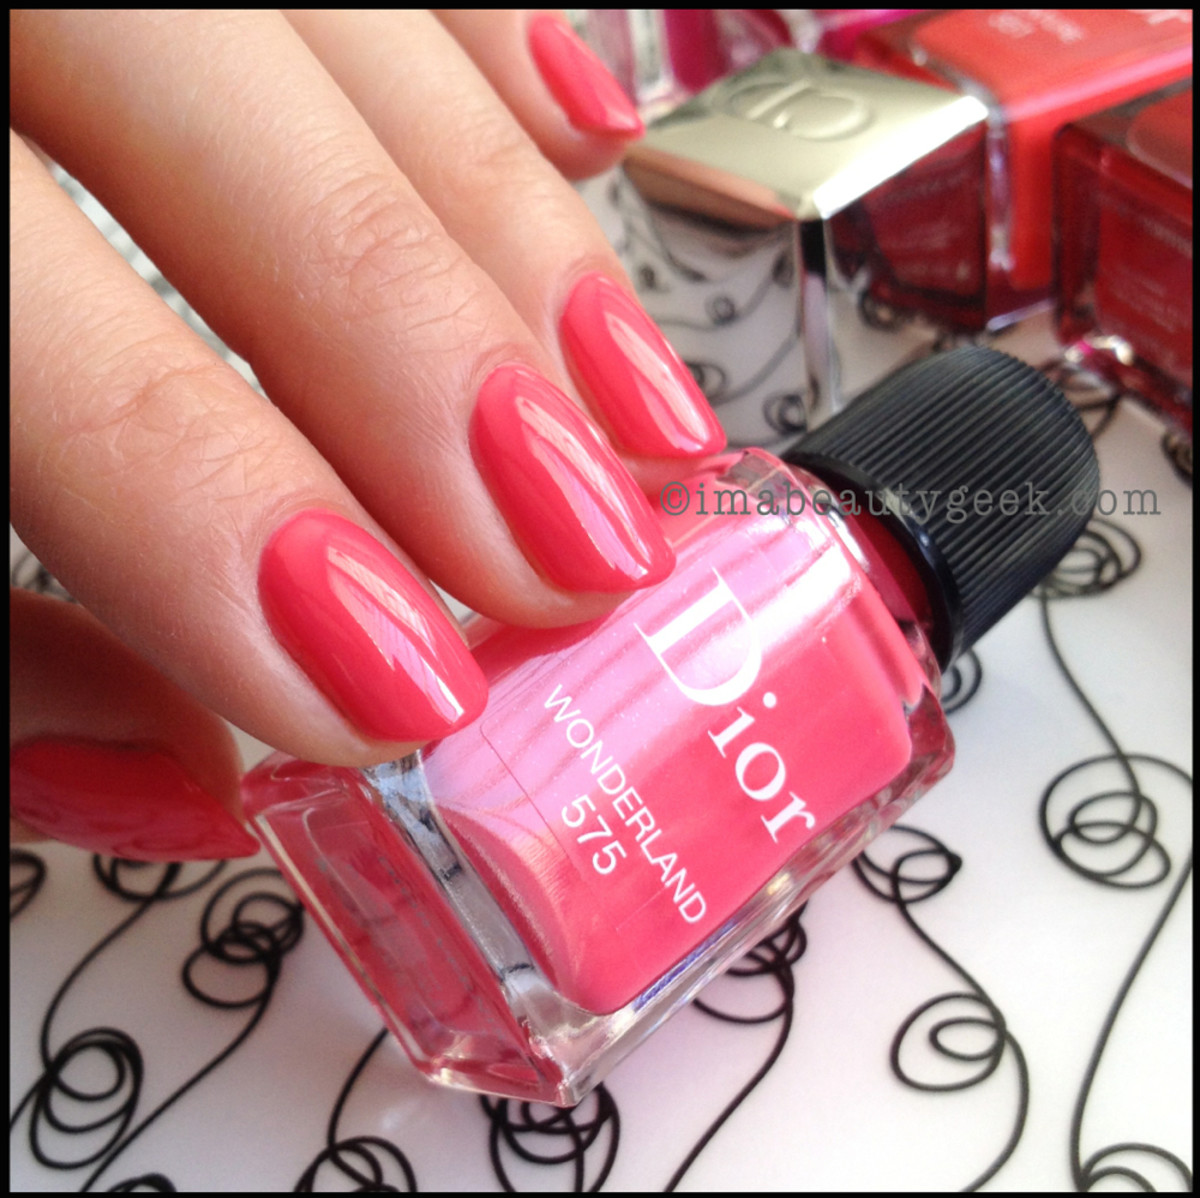 Dior polish Wonderland 575_Dior Gel Shine